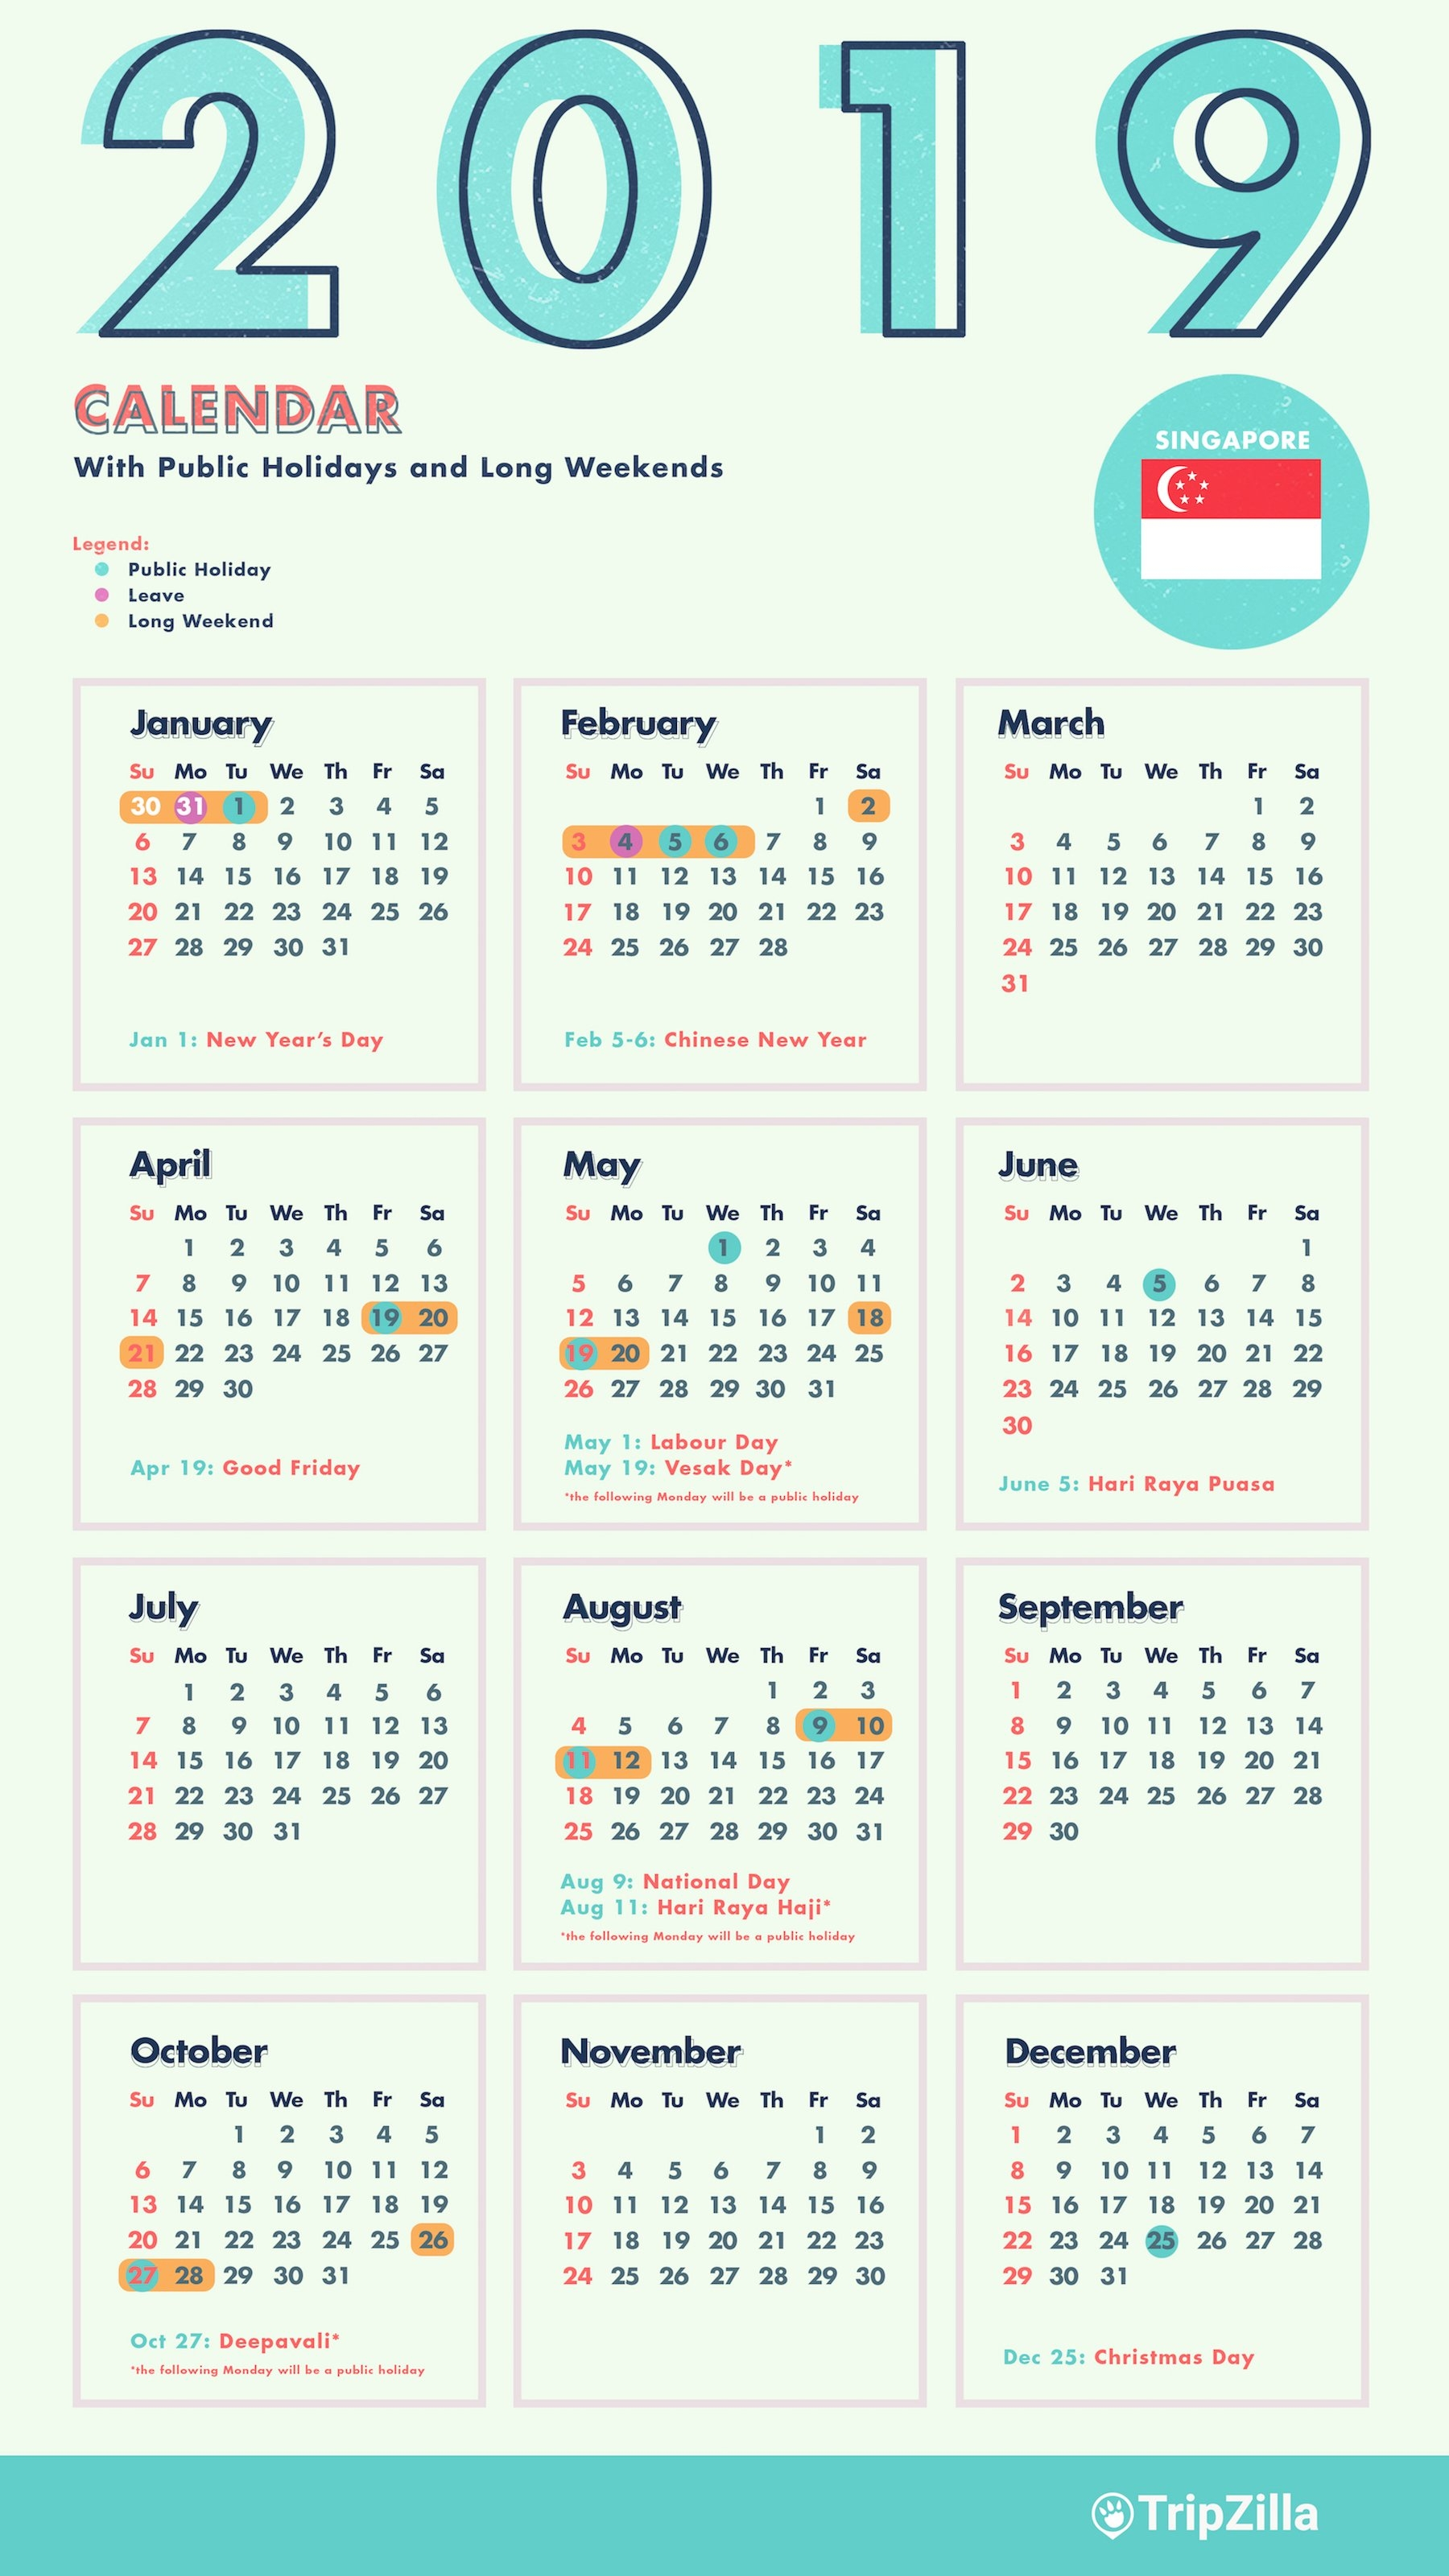 6 Long Weekends In Singapore In 2019 (Bonus Calendar & Cheatsheet) Calendar 2019 Good Friday